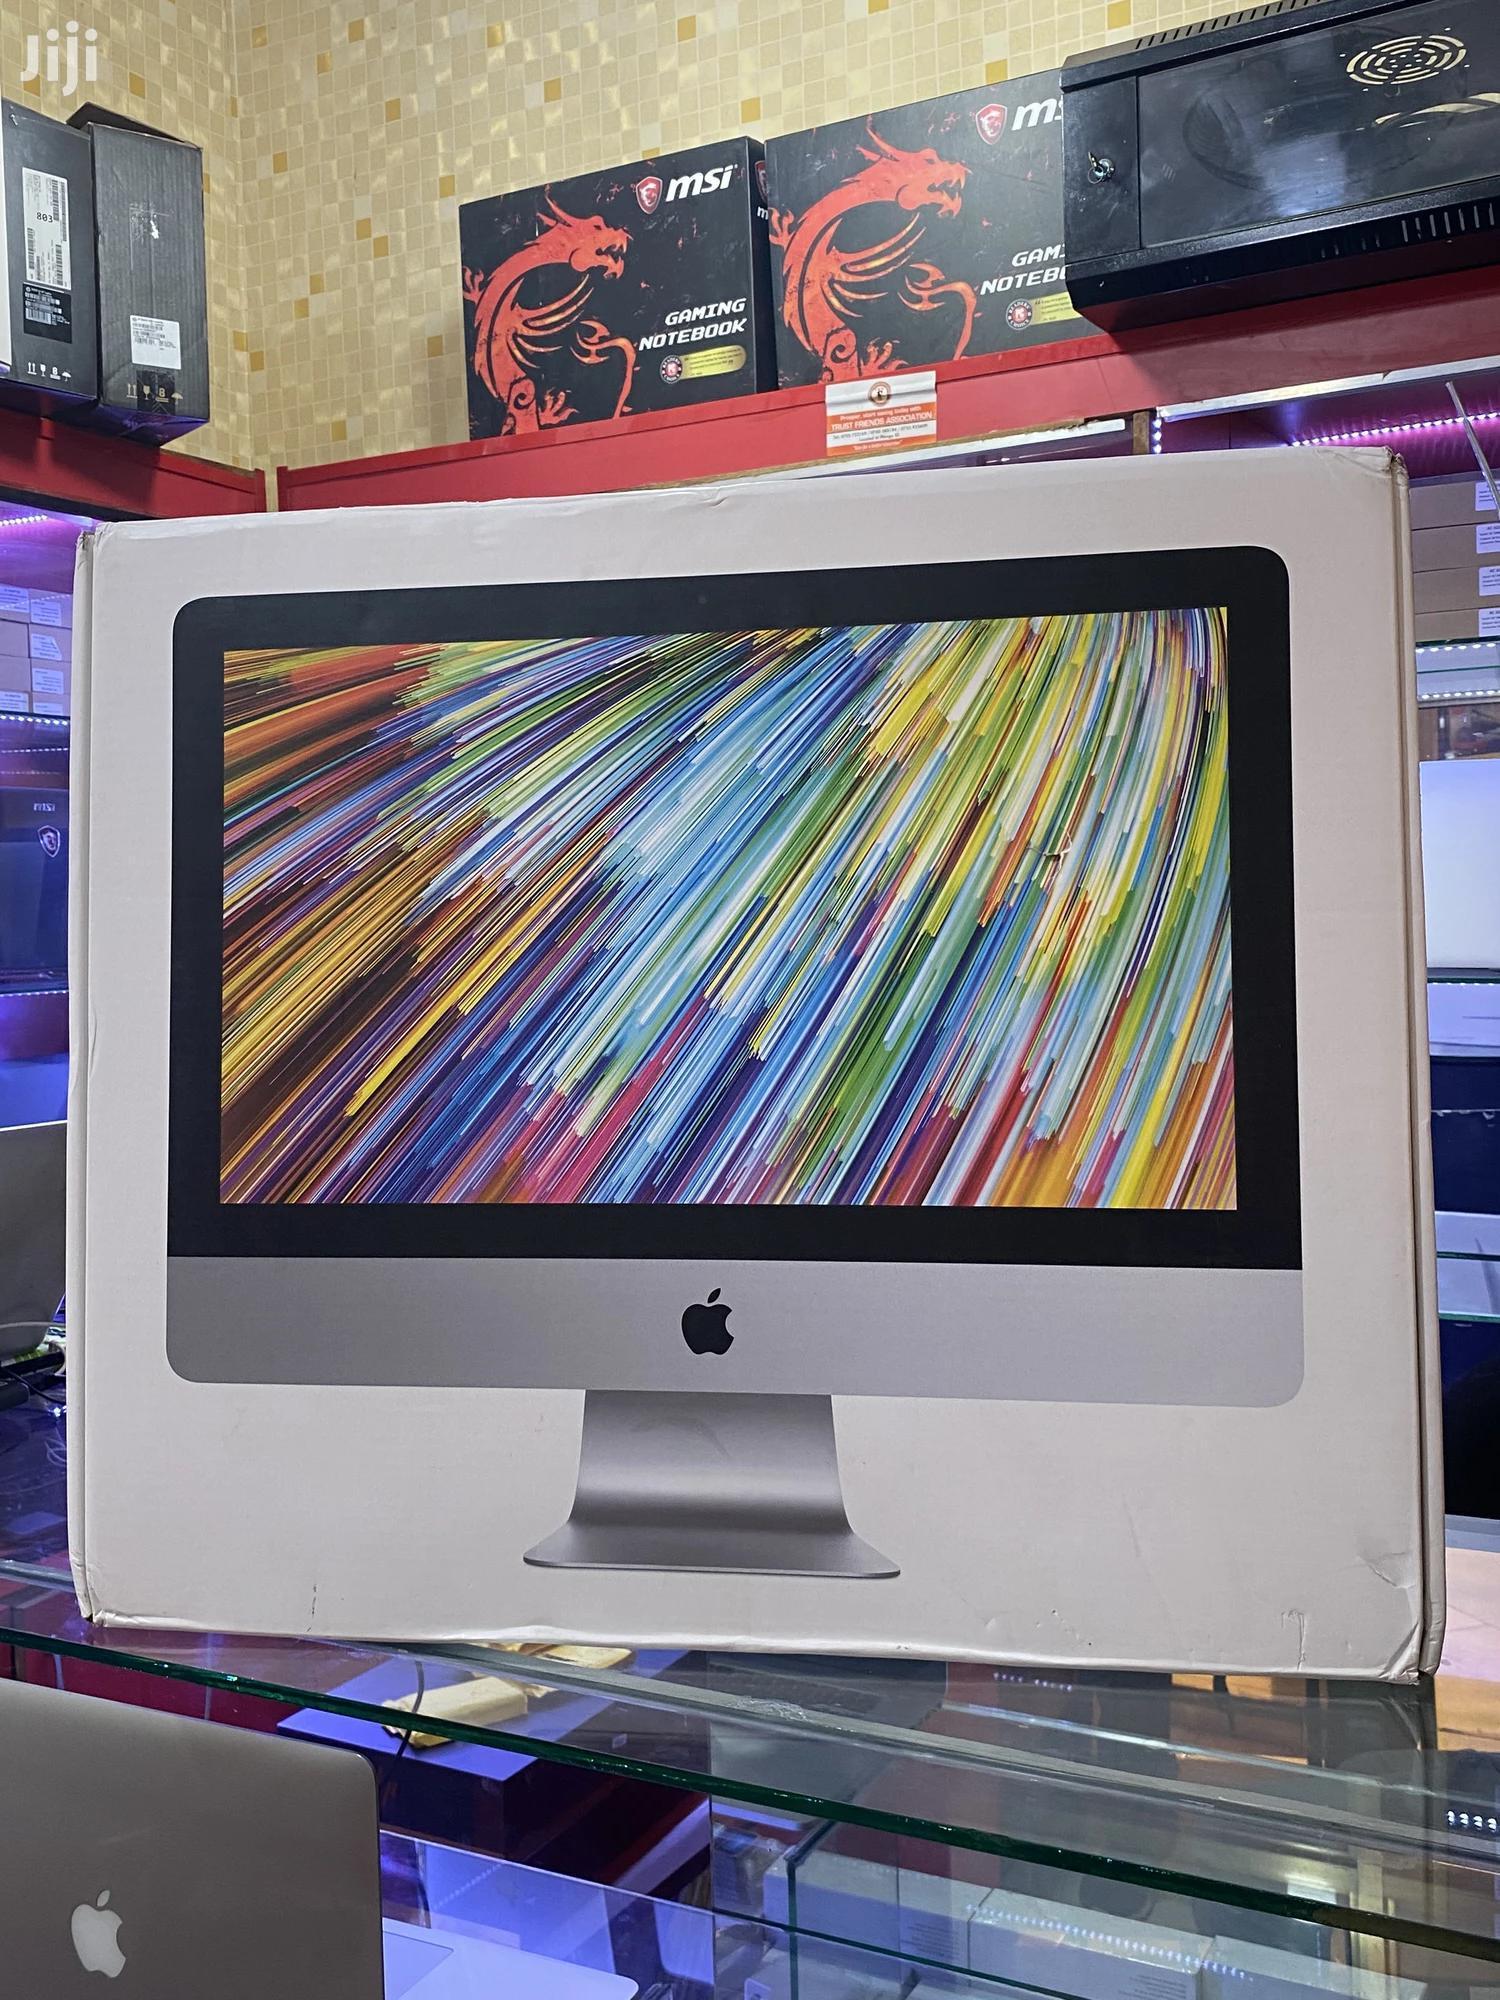 New Desktop Computer Apple iMac 8GB Intel Core i5 SSHD (Hybrid) 1T